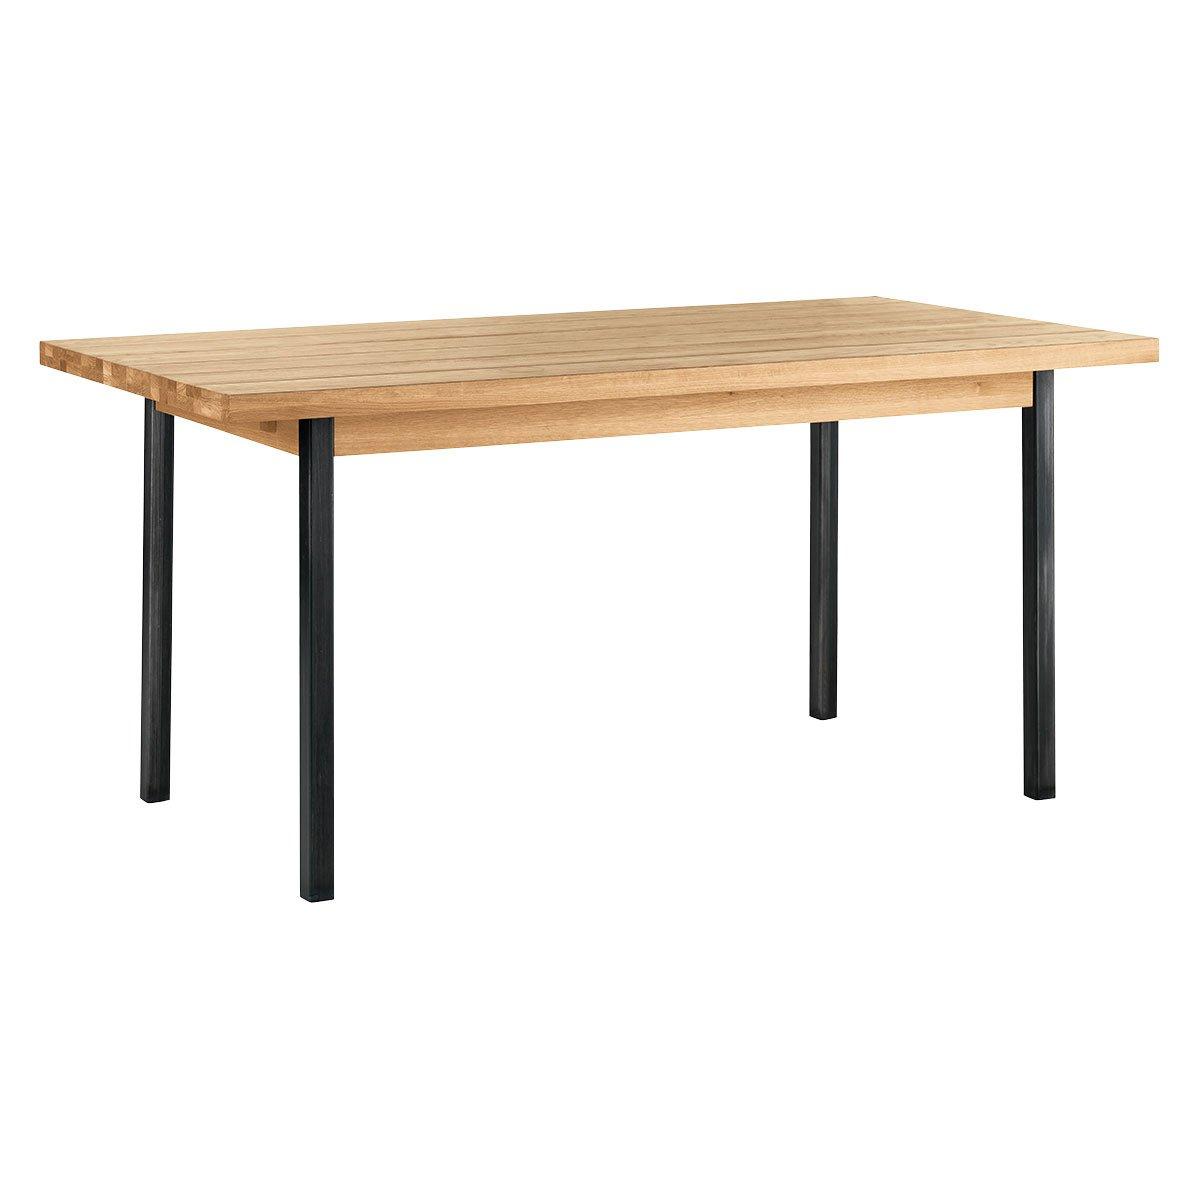 Habitat Feliz Extending Wood Oak 6 to 12 Seater Dining Table